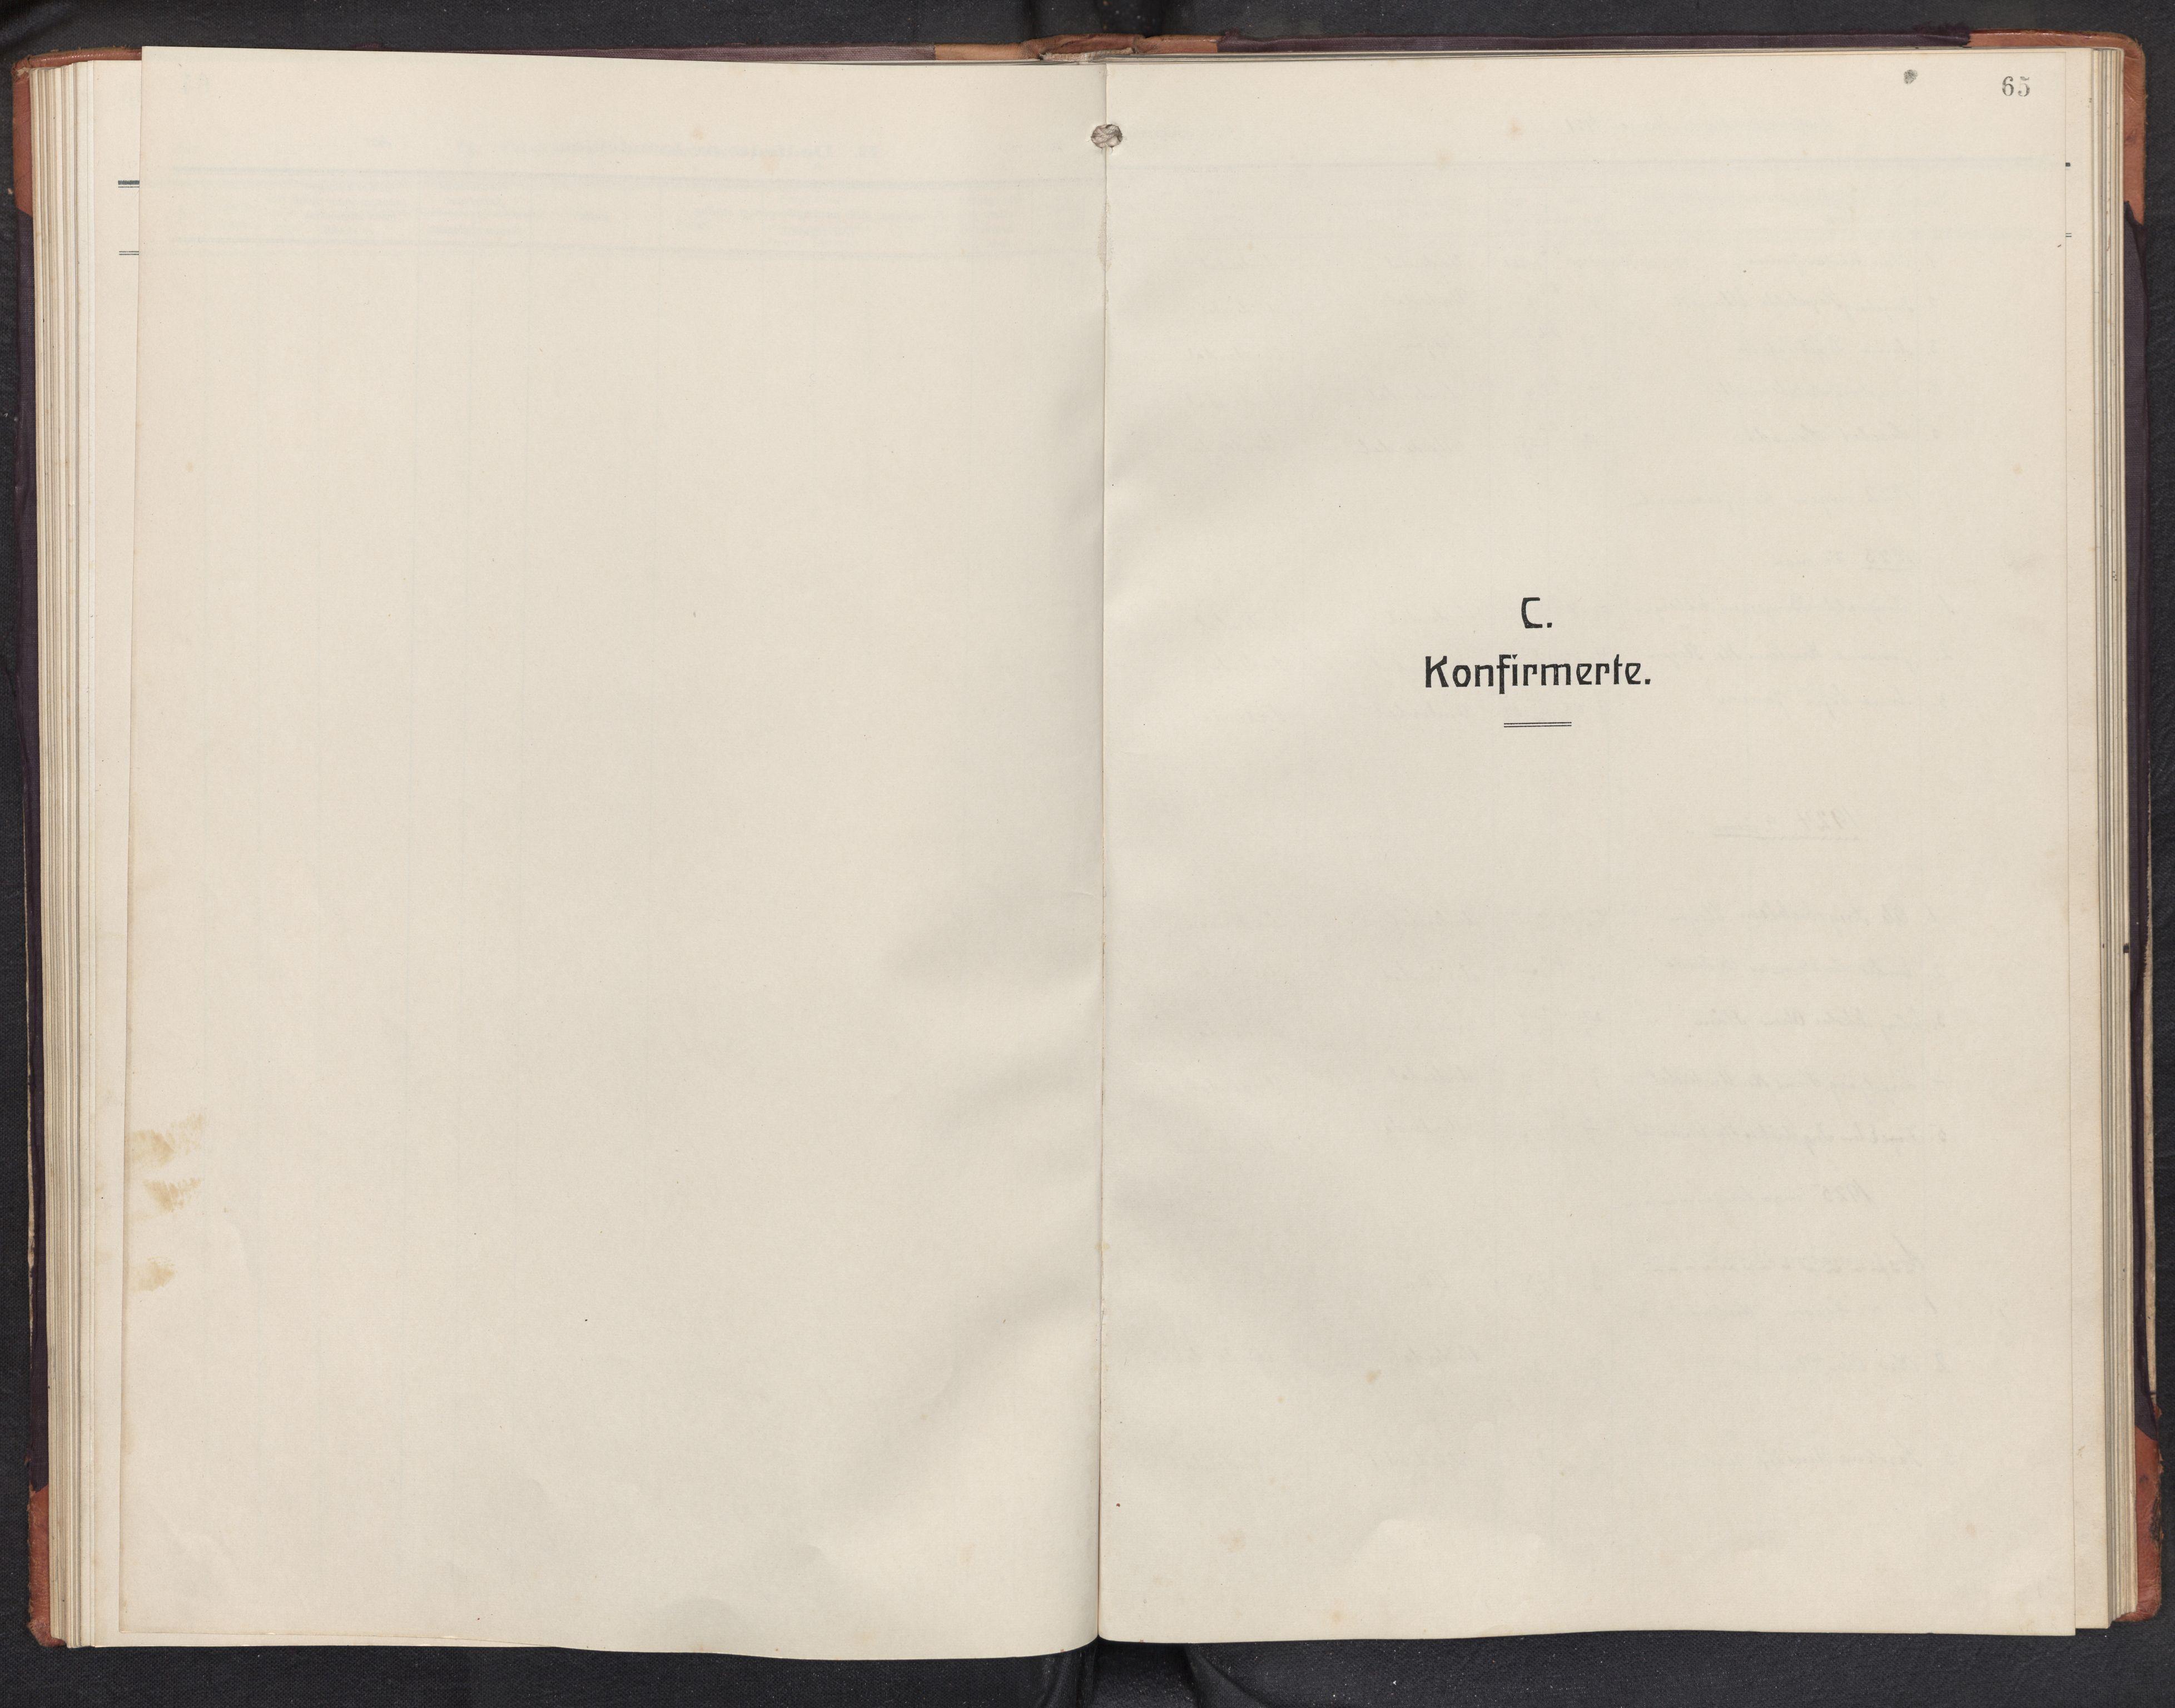 SAB, Aurland sokneprestembete, H/Hb/Hbd/L0003: Klokkerbok nr. D 3, 1920-1968, s. 64b-65a